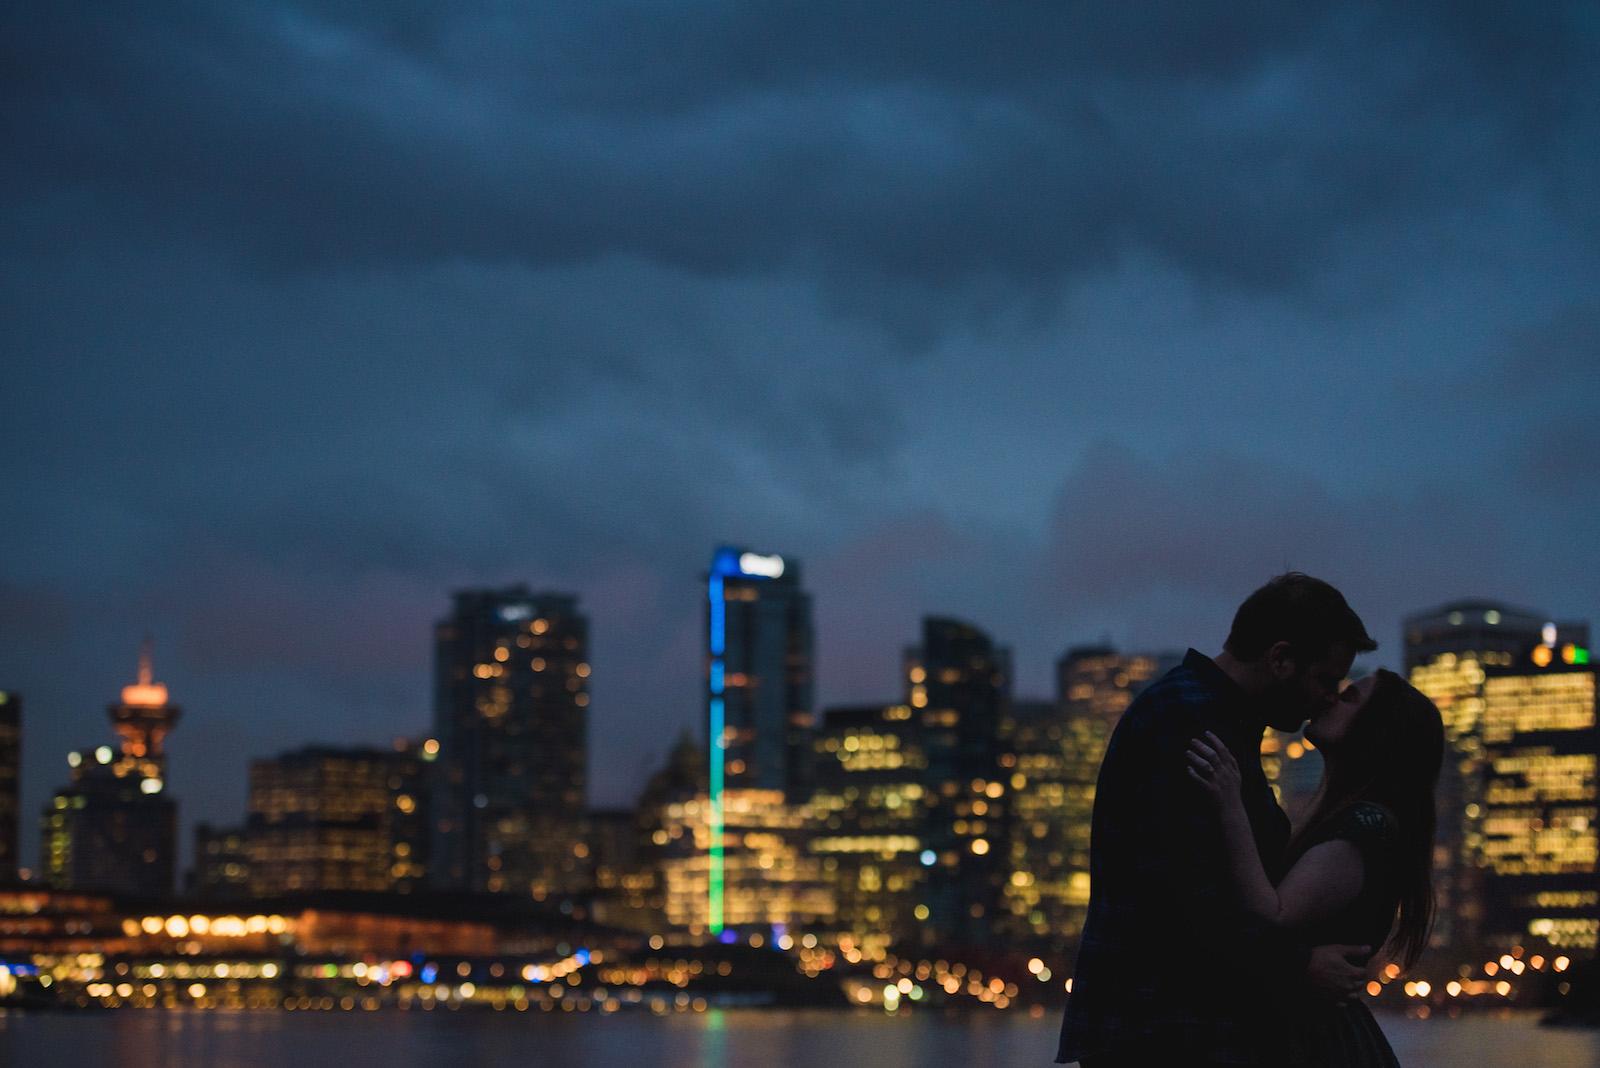 vancouver-island-wedding-photographers-rainy-stanley-park-engagement-17.jpg